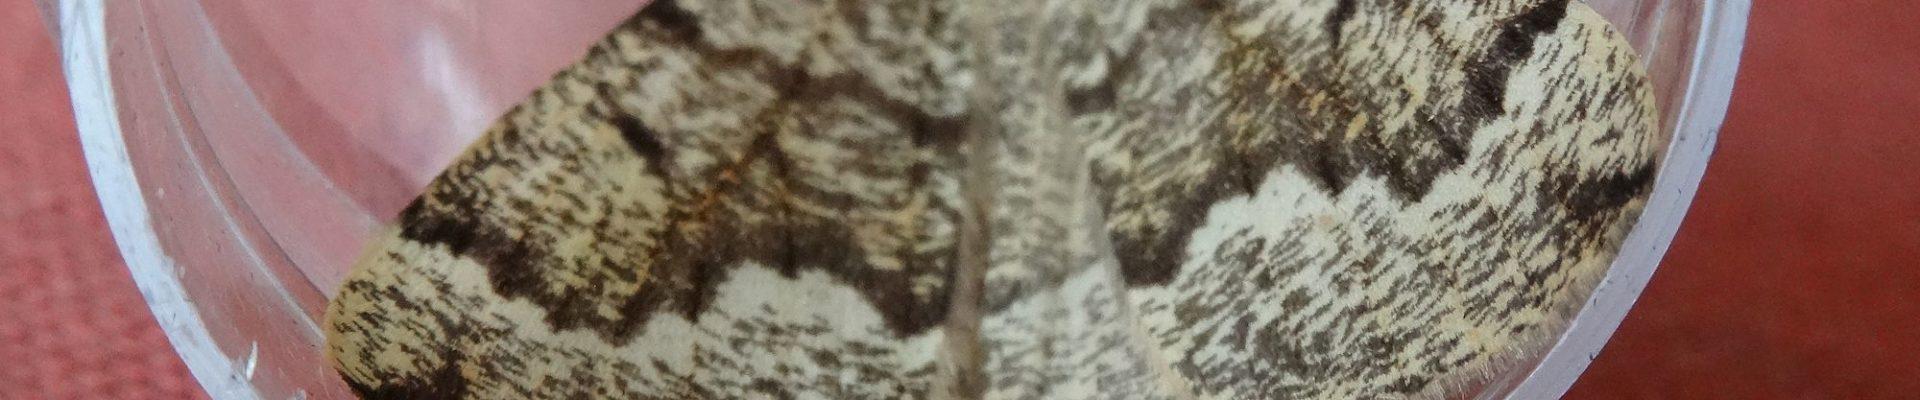 De zeldzame Dennenbandspanner in Orvelte gezien